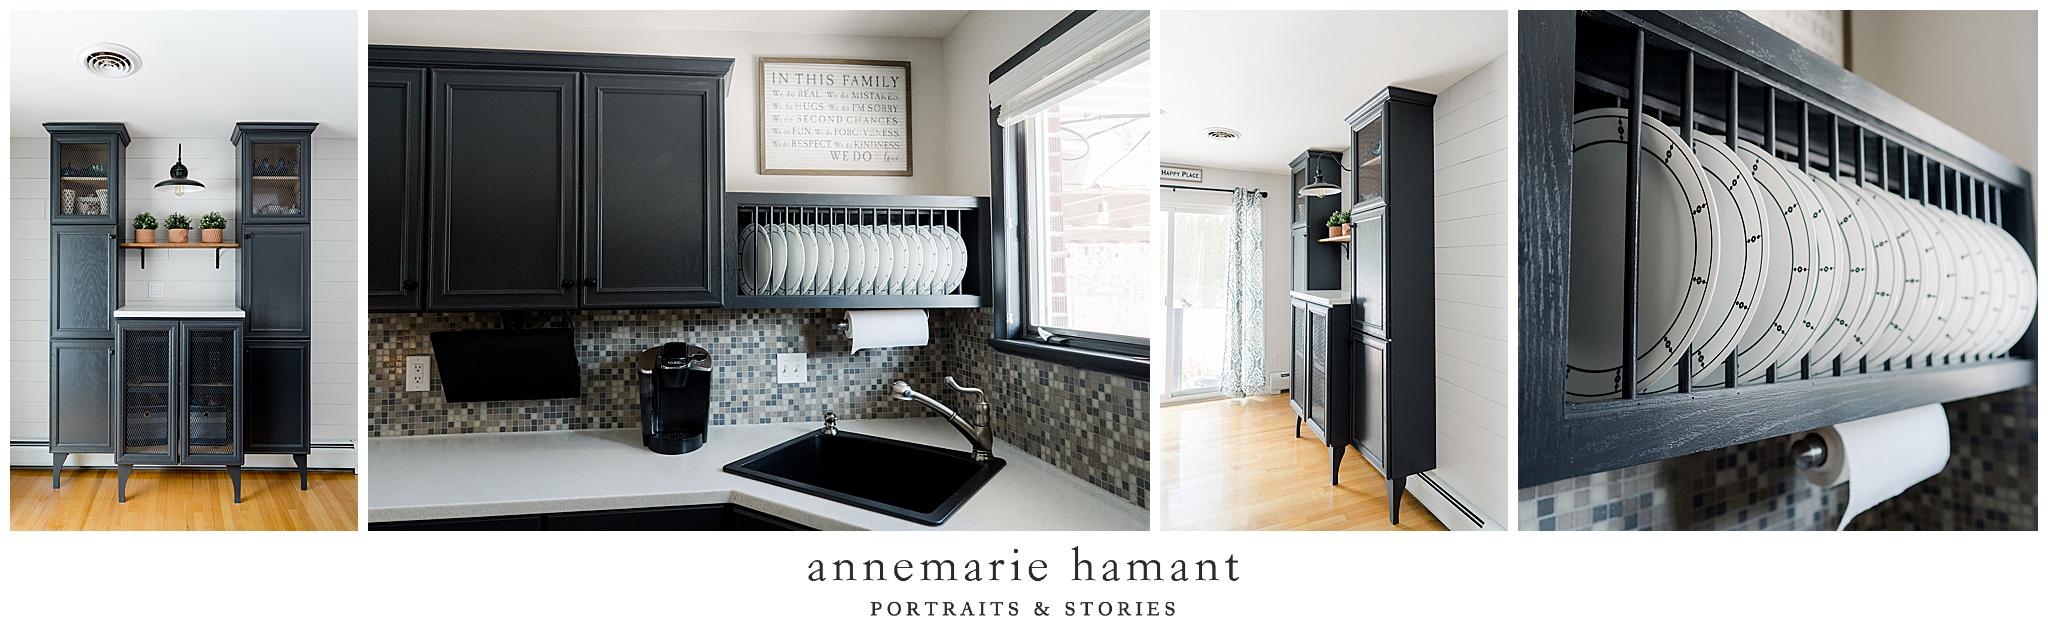 AnneMarie_Hamant_personal_brand_photographer_0141.jpg